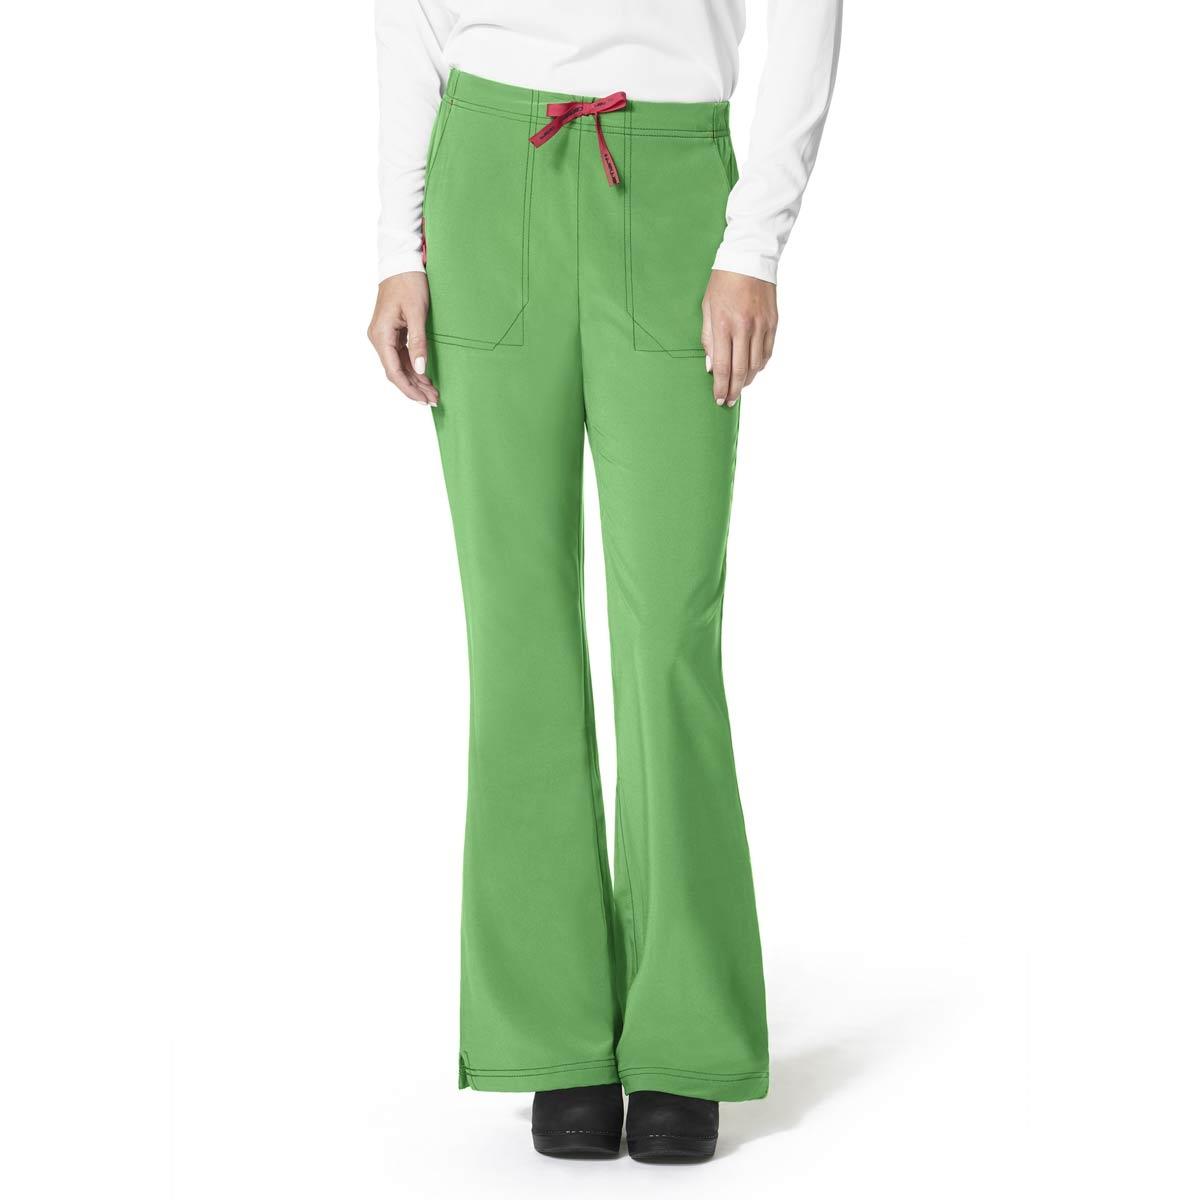 e75a389e793 Cross-Flex Scrub Pants For Women In Flat Front Flare Leg